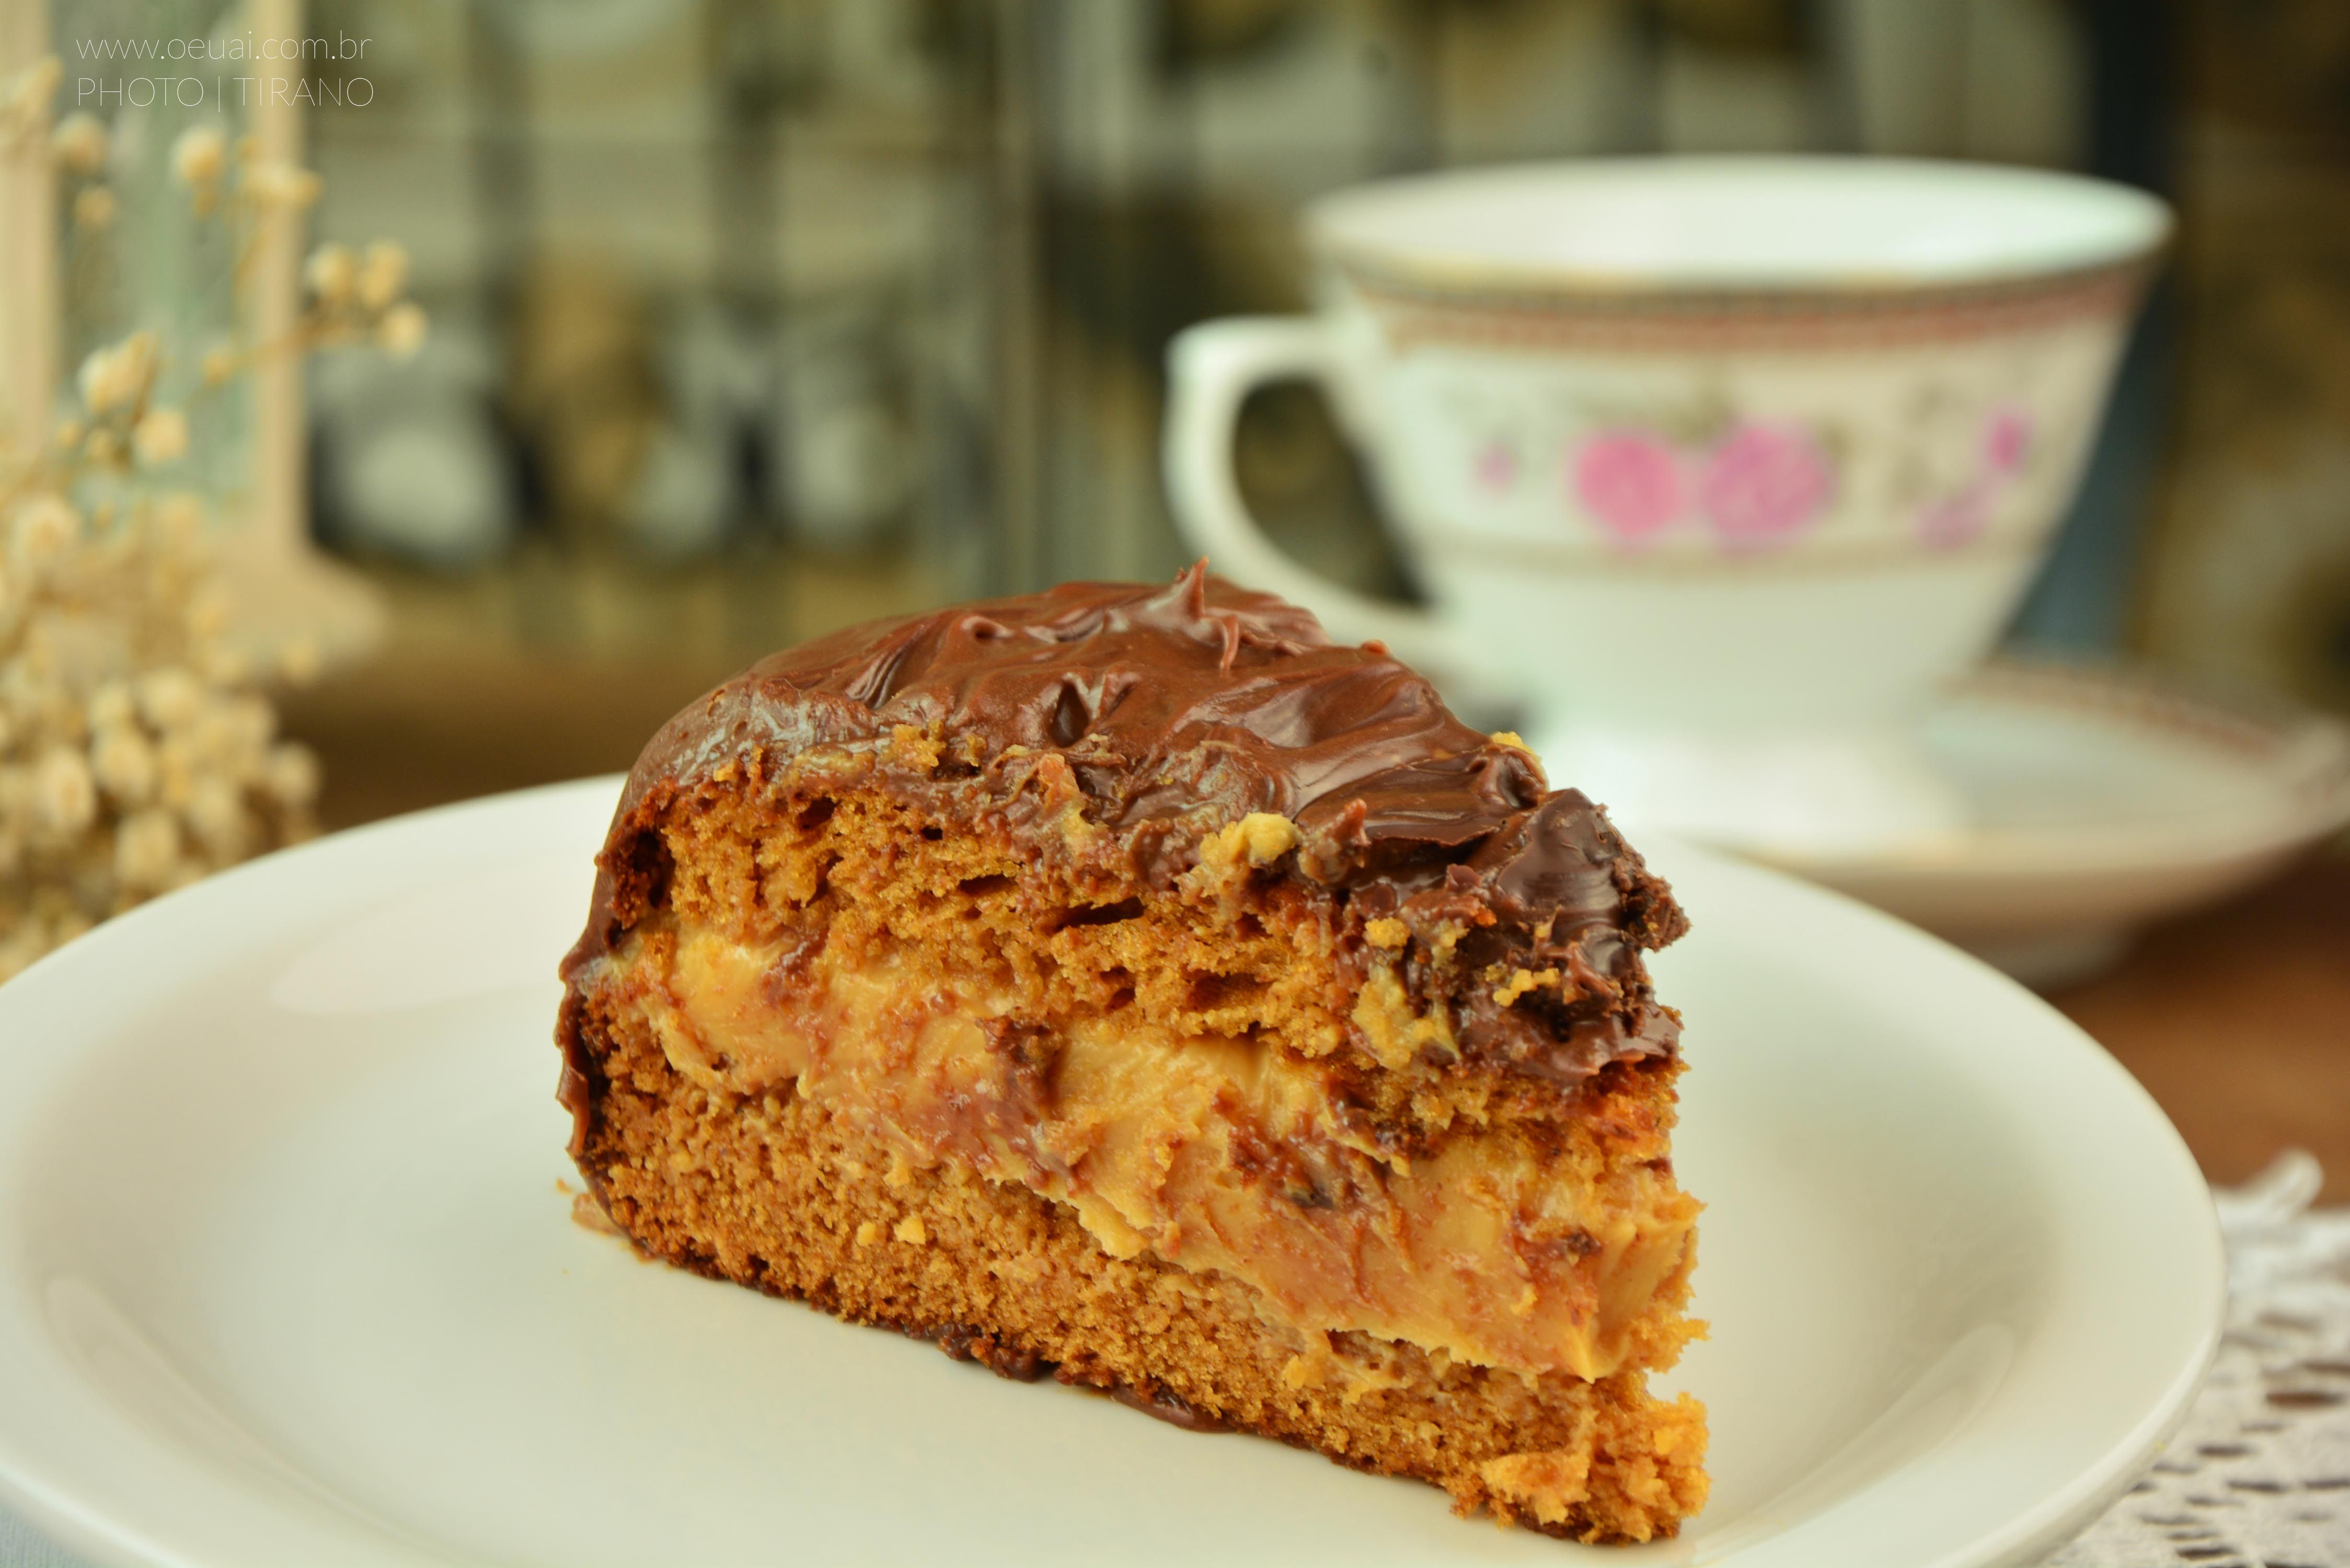 Fotografia de produto por Tirano, still. Fotografia de pedaço de bolo de pão de mel.  #fotografia #fotografiadecomida #bolo